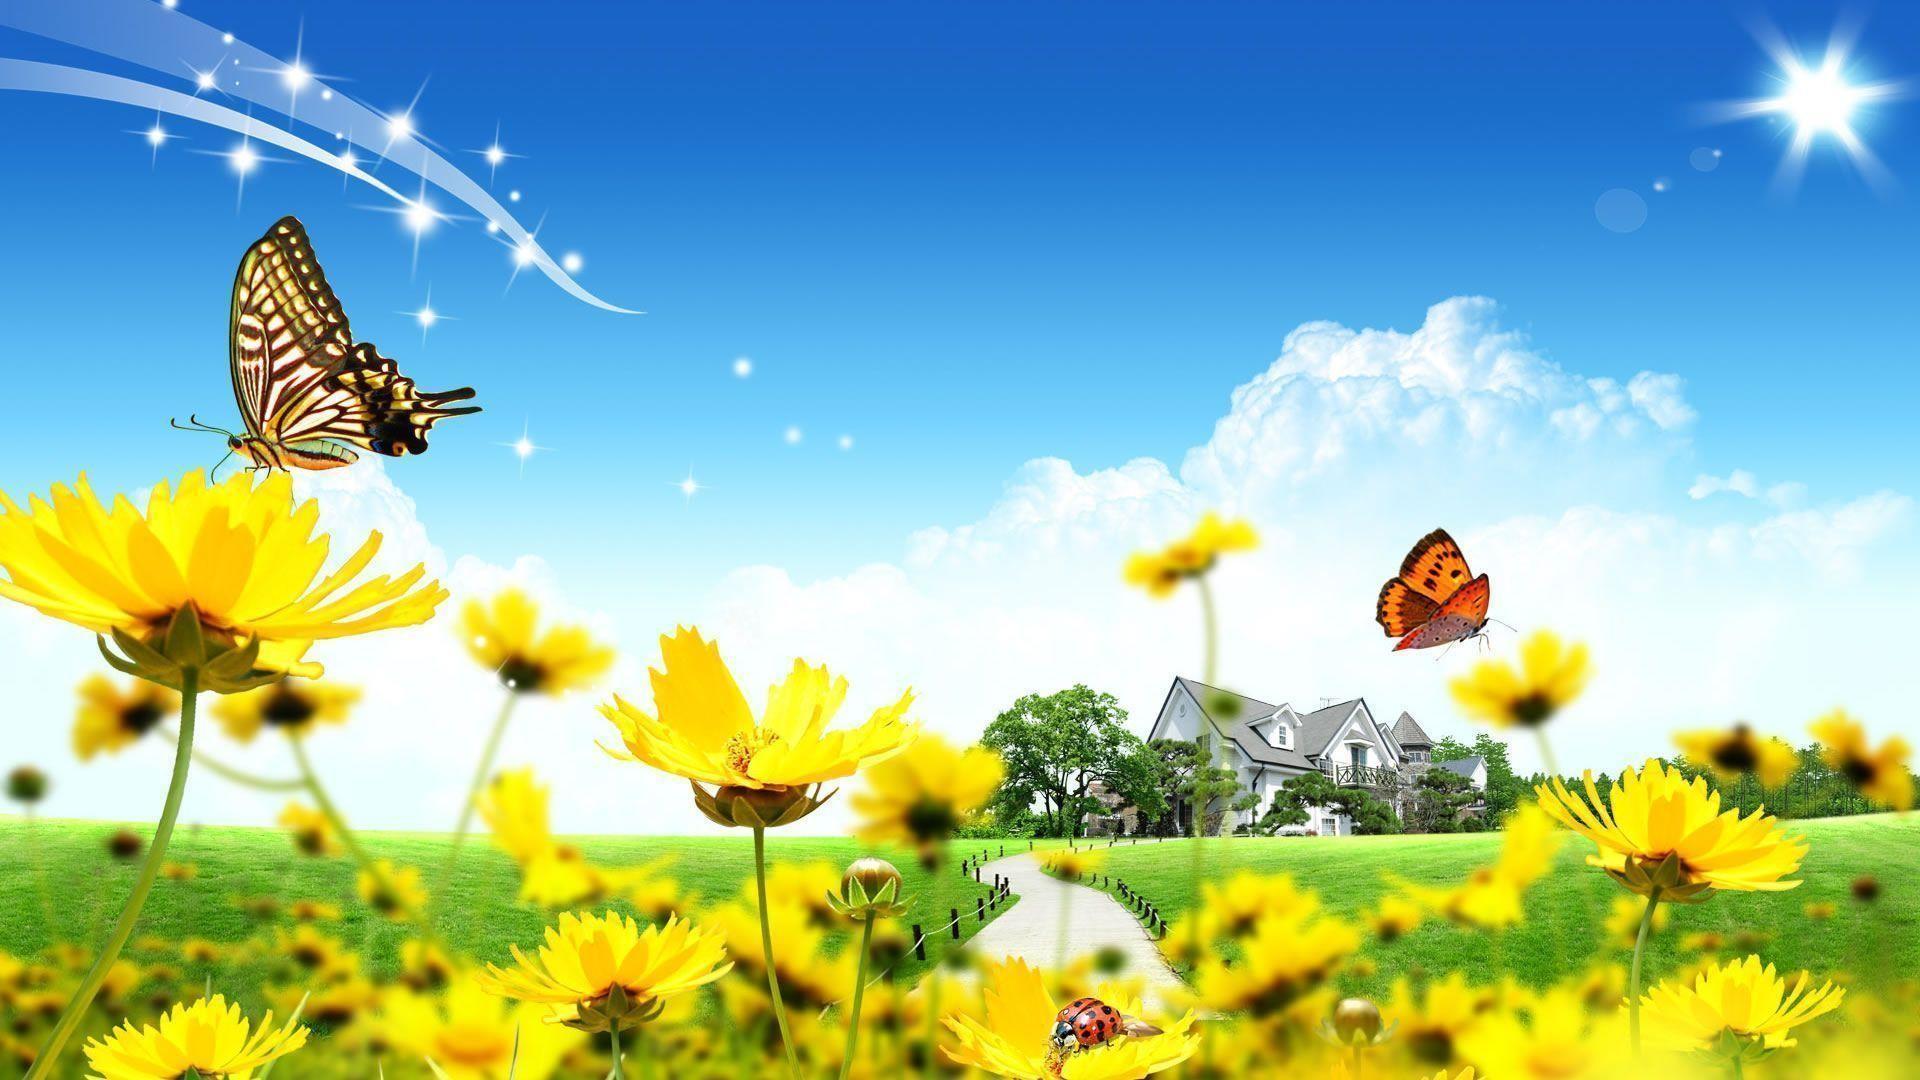 Beautiful Wallpaper Name Kamran - 78979  Image_49421.jpg